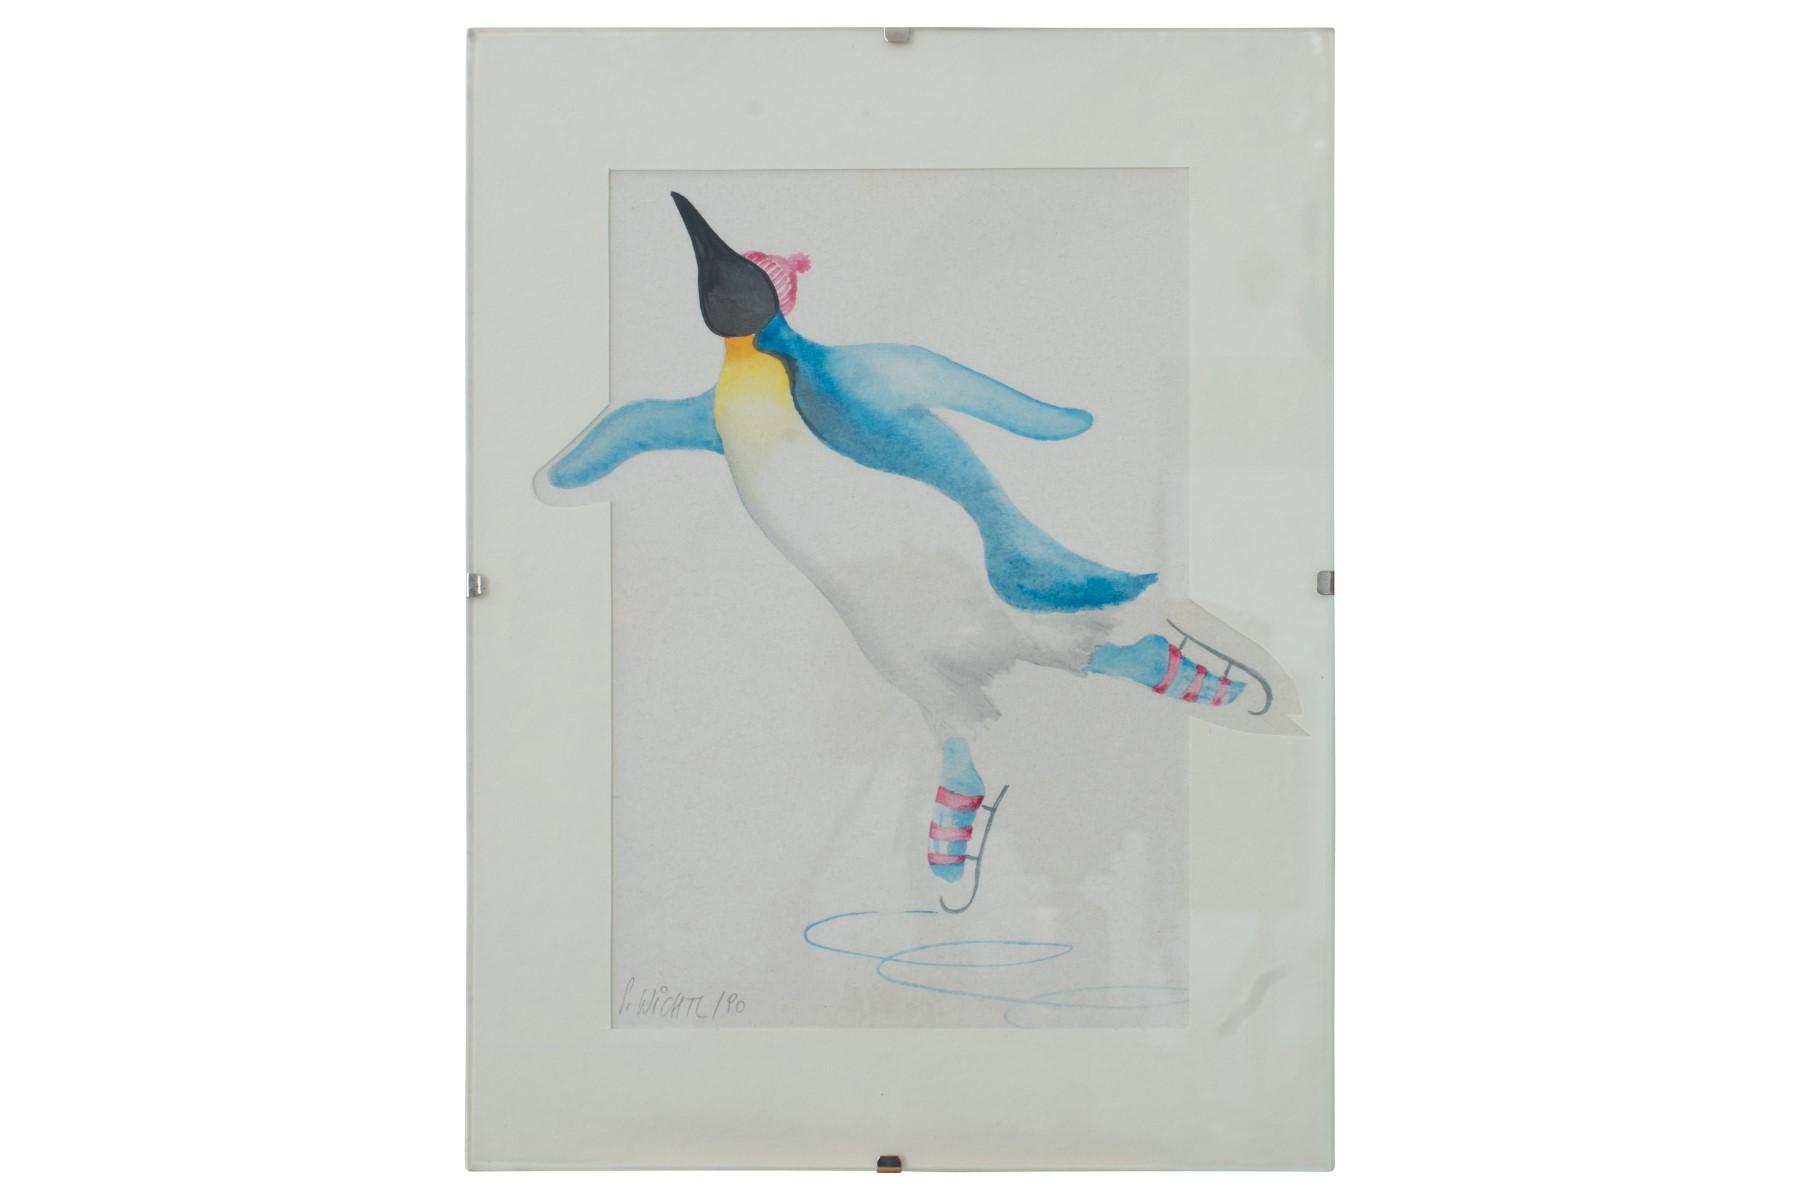 #48 Silvia Wichtl( 1945) , Ice dancing penguin   Silvia Wichtl (1945) , Eistanzender Pinguin Image